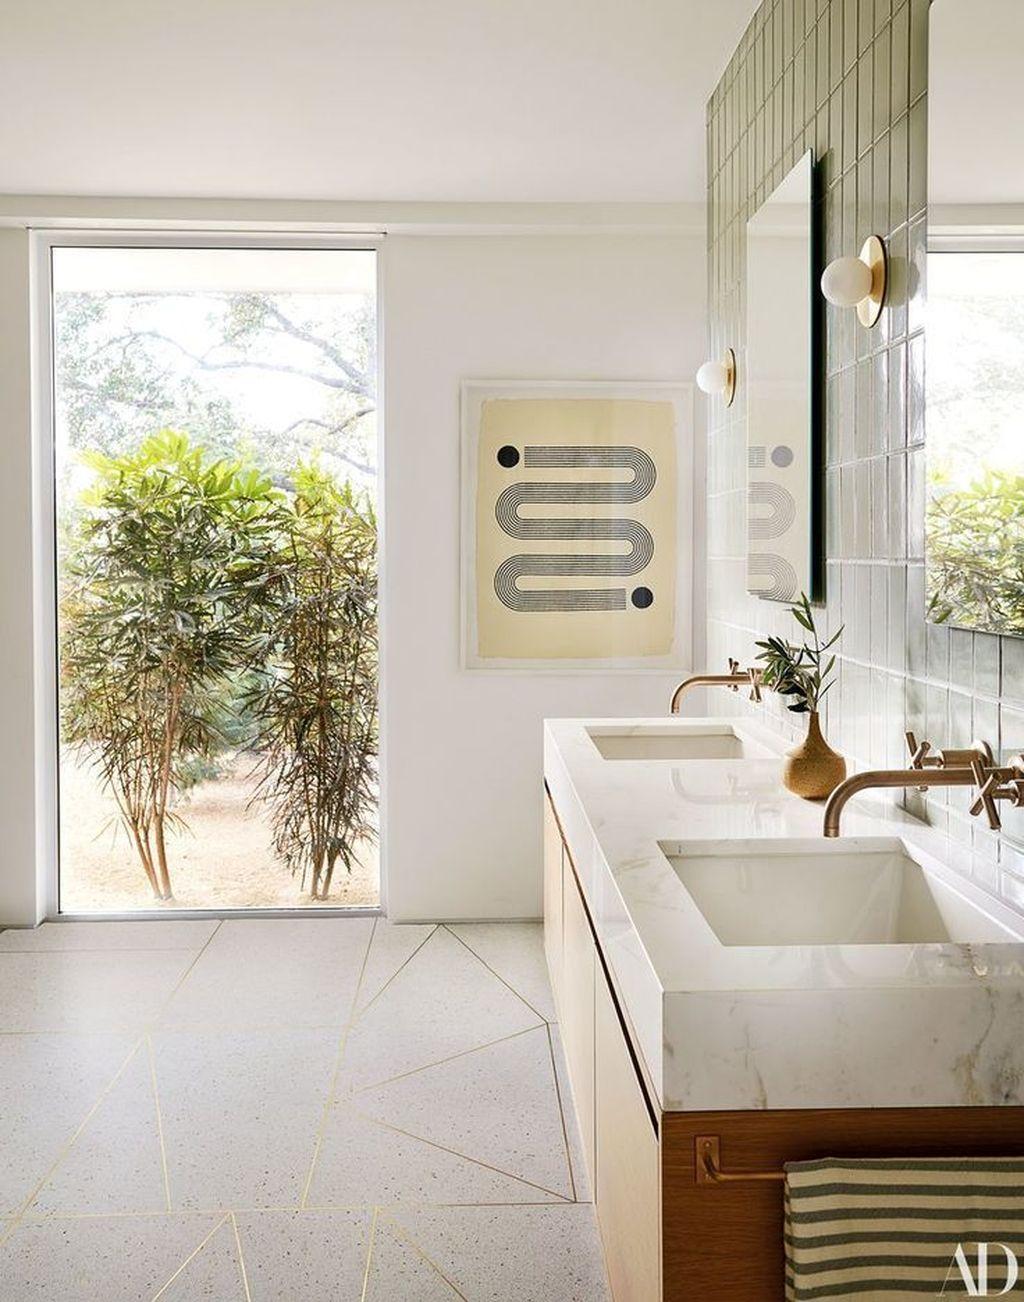 Admirable Rustic Modern Bathroom Design And Decor Ideas 21